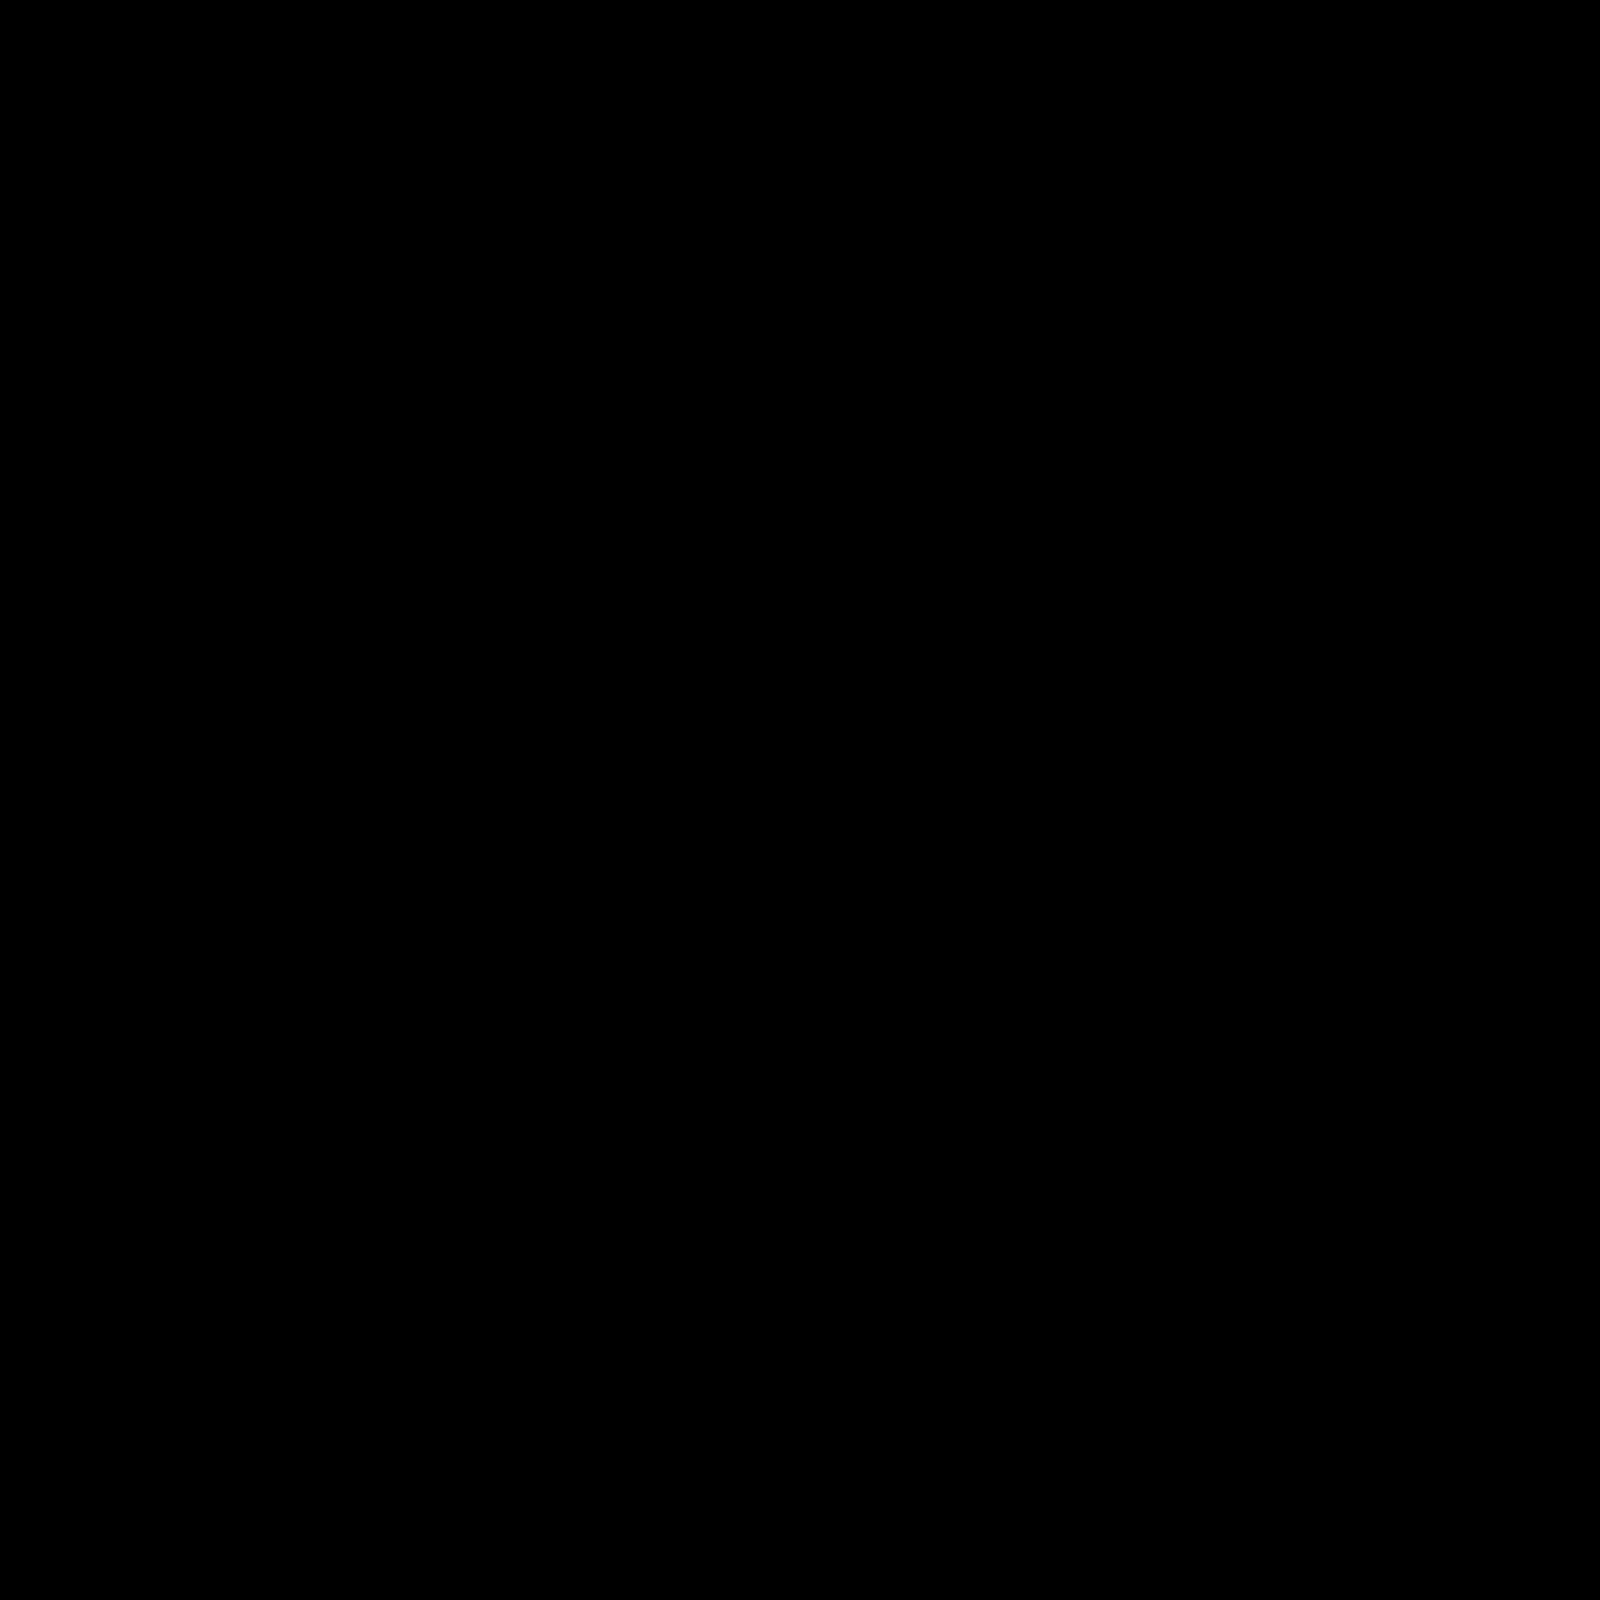 Katakana Re icon